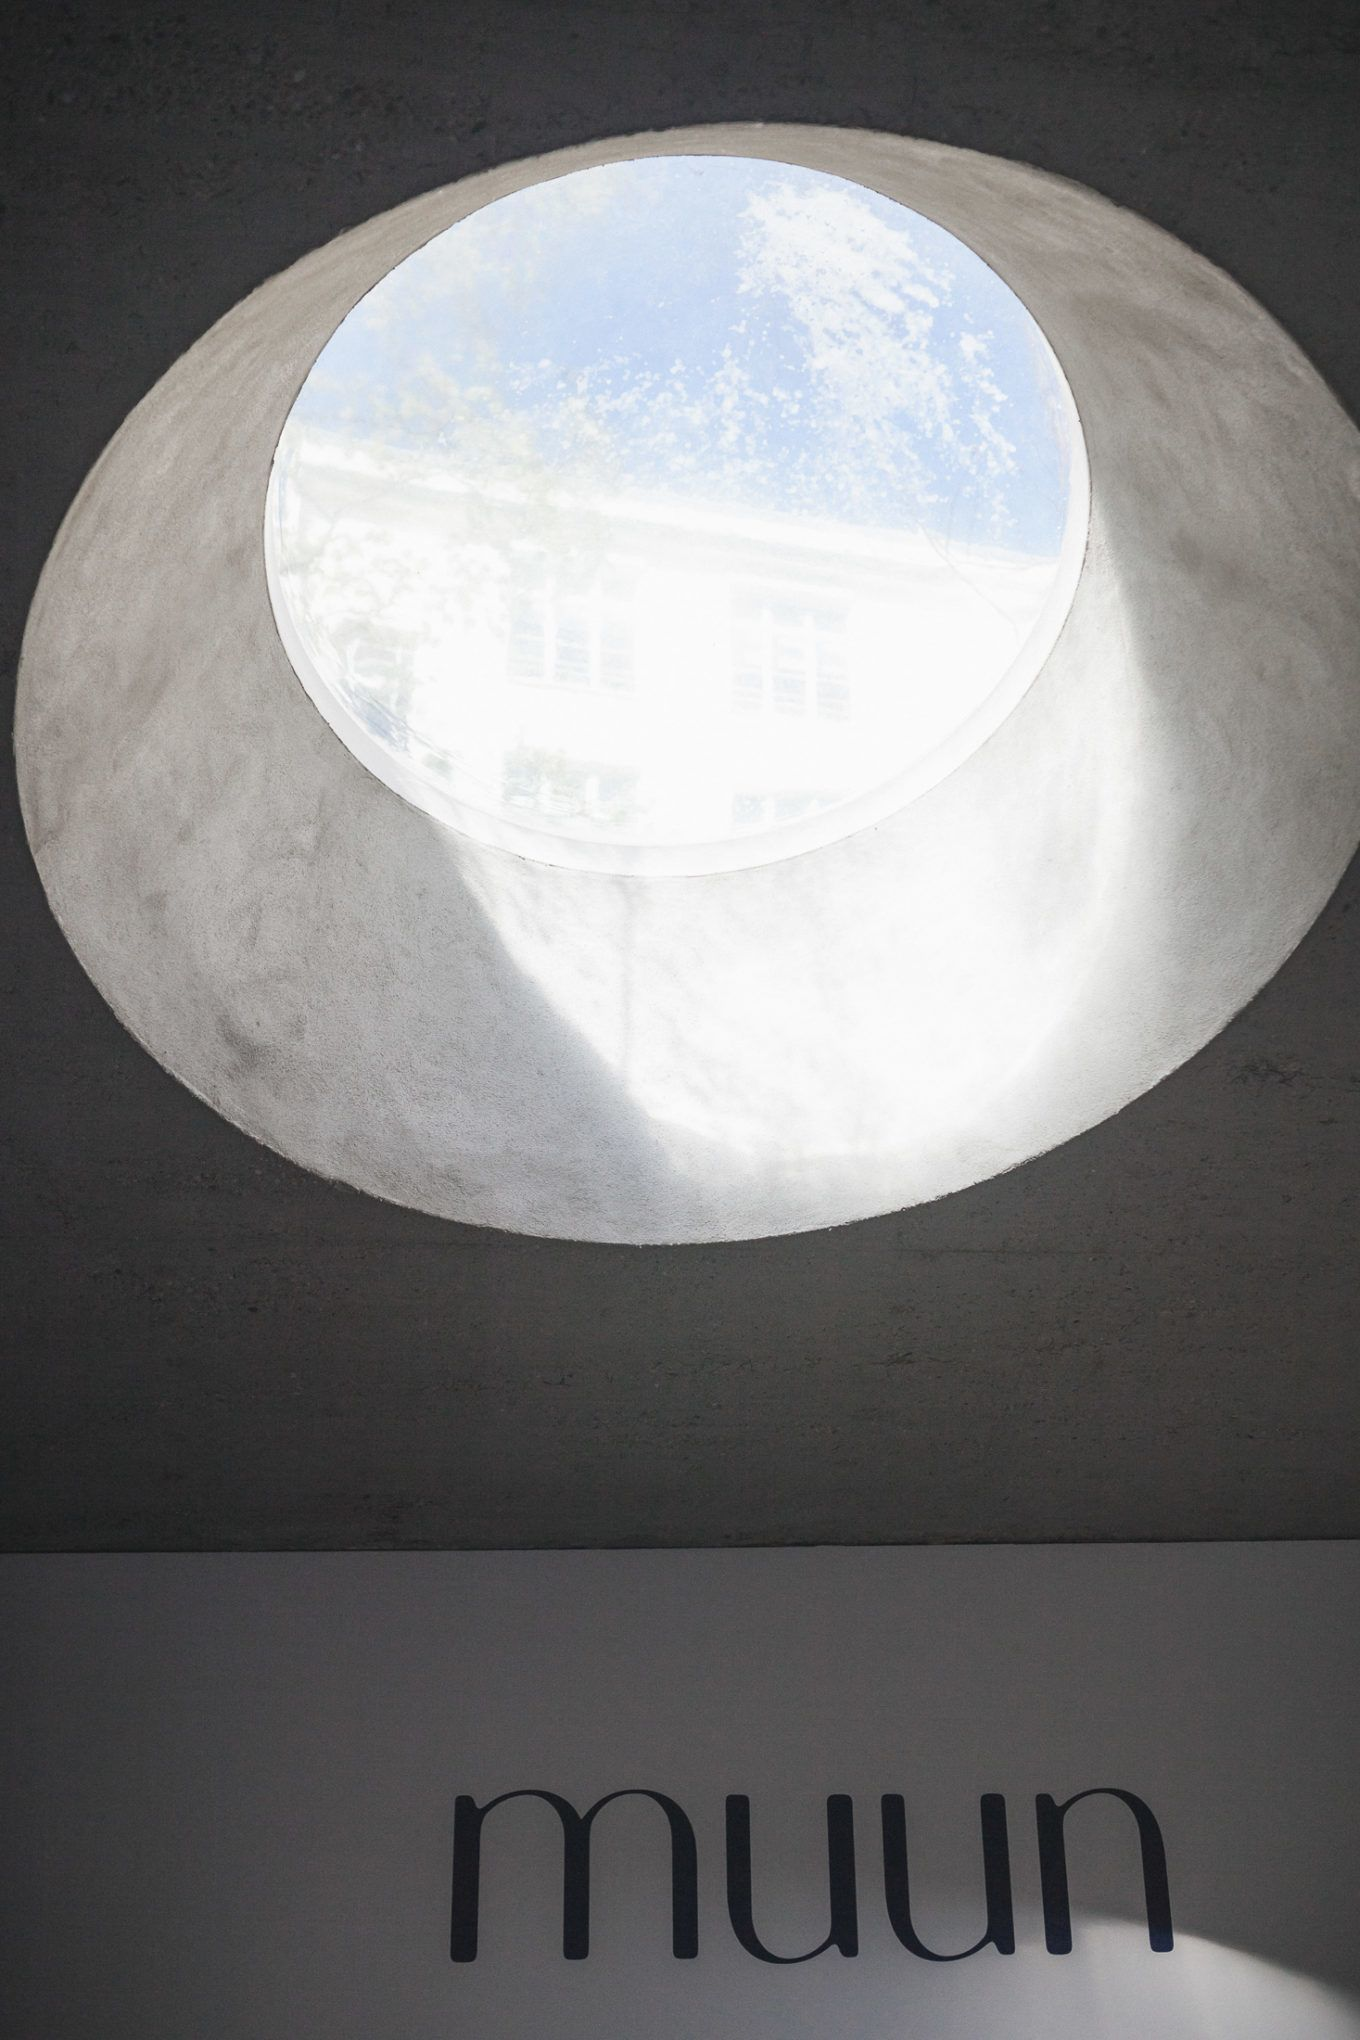 Muun Showroom window